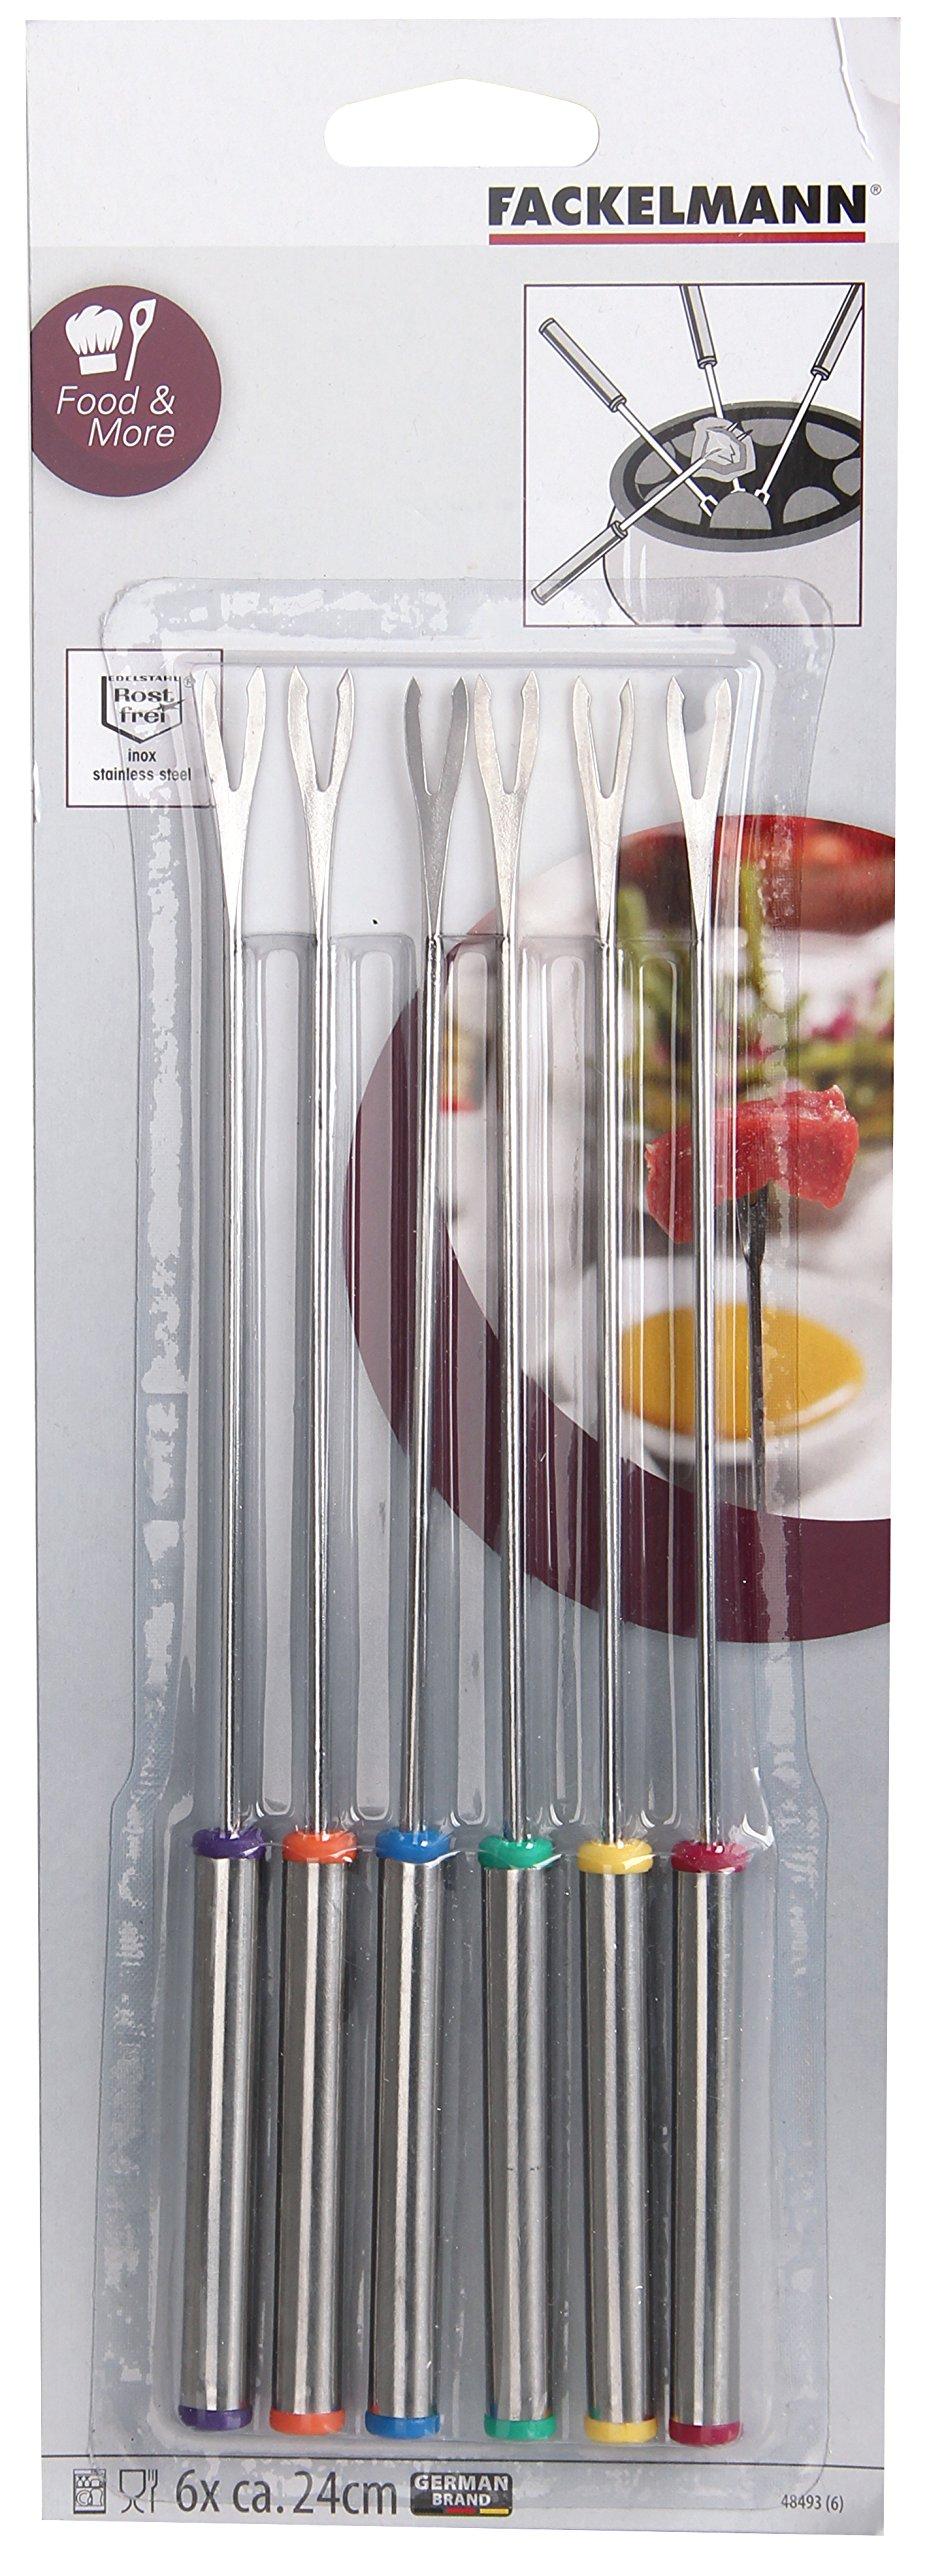 Fackelmann 48493 6 pieces 9, 4'' of stainless steel Fondue forks Set, Silver/Black/Blue/Yellow/Orange/Green/Red, One size by Fackelmann (Image #3)